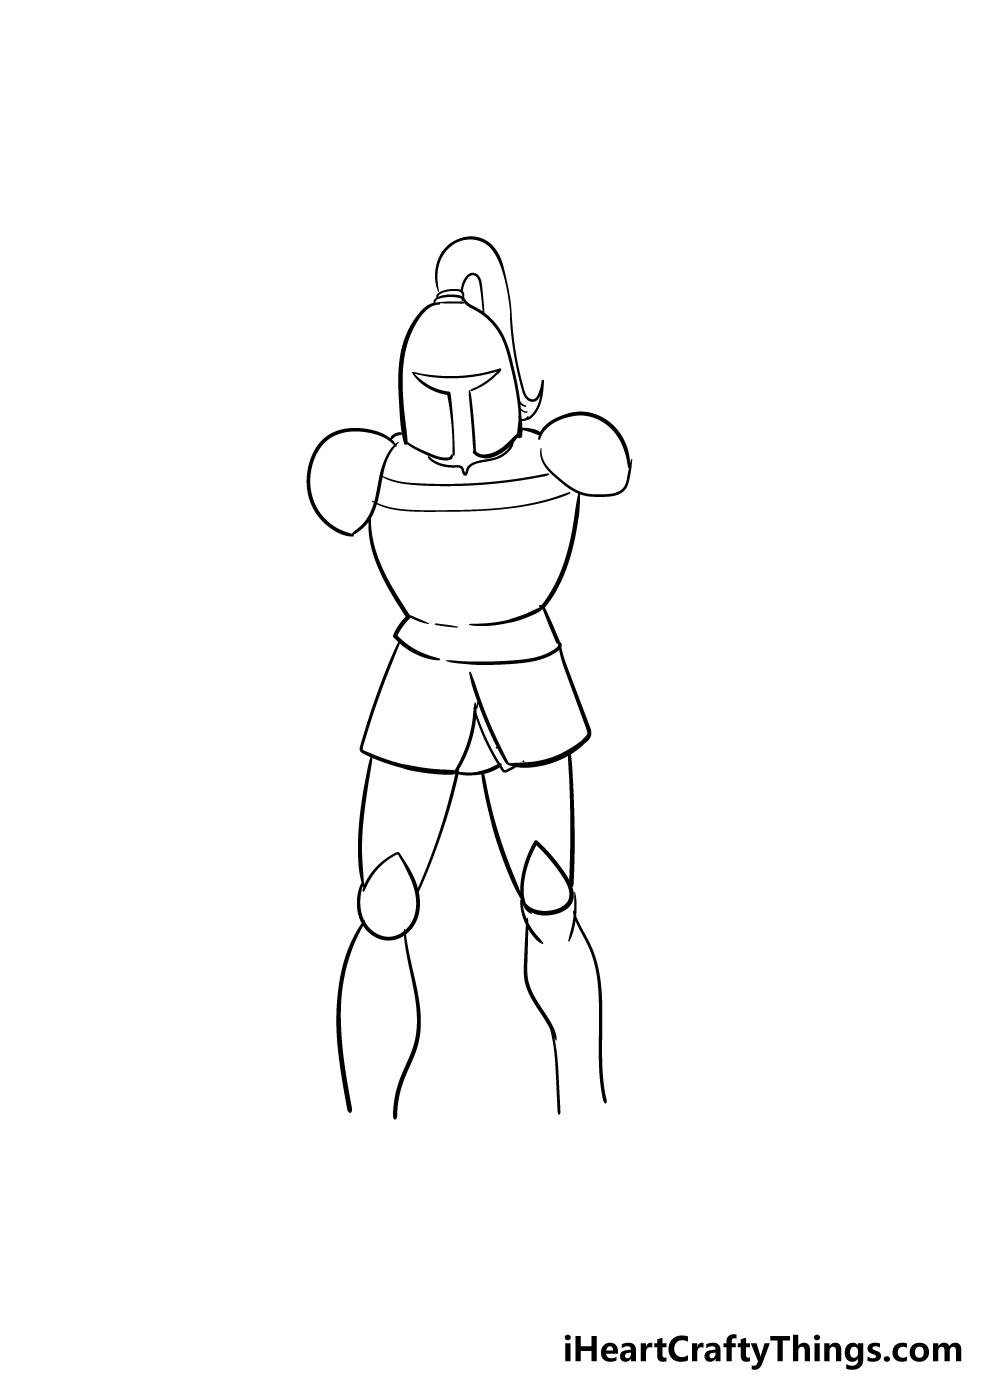 knight drawing step 4